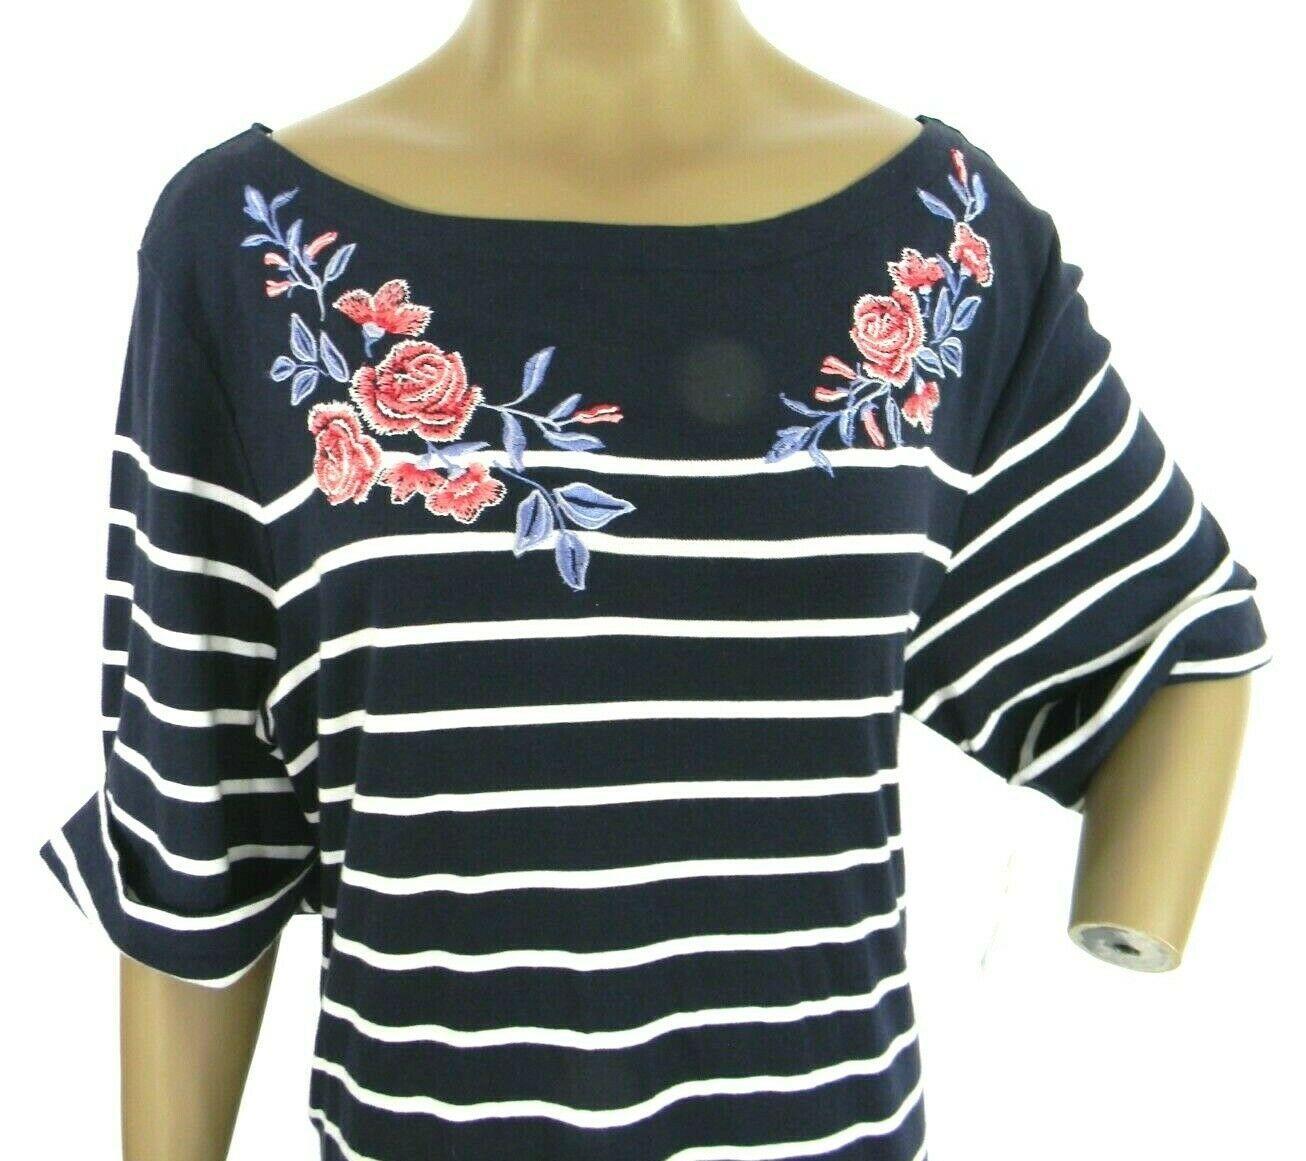 Karen Scott Plus Size 2X,3X Dress Floral Embroidered Striped Shift Dress NEW $54 image 6